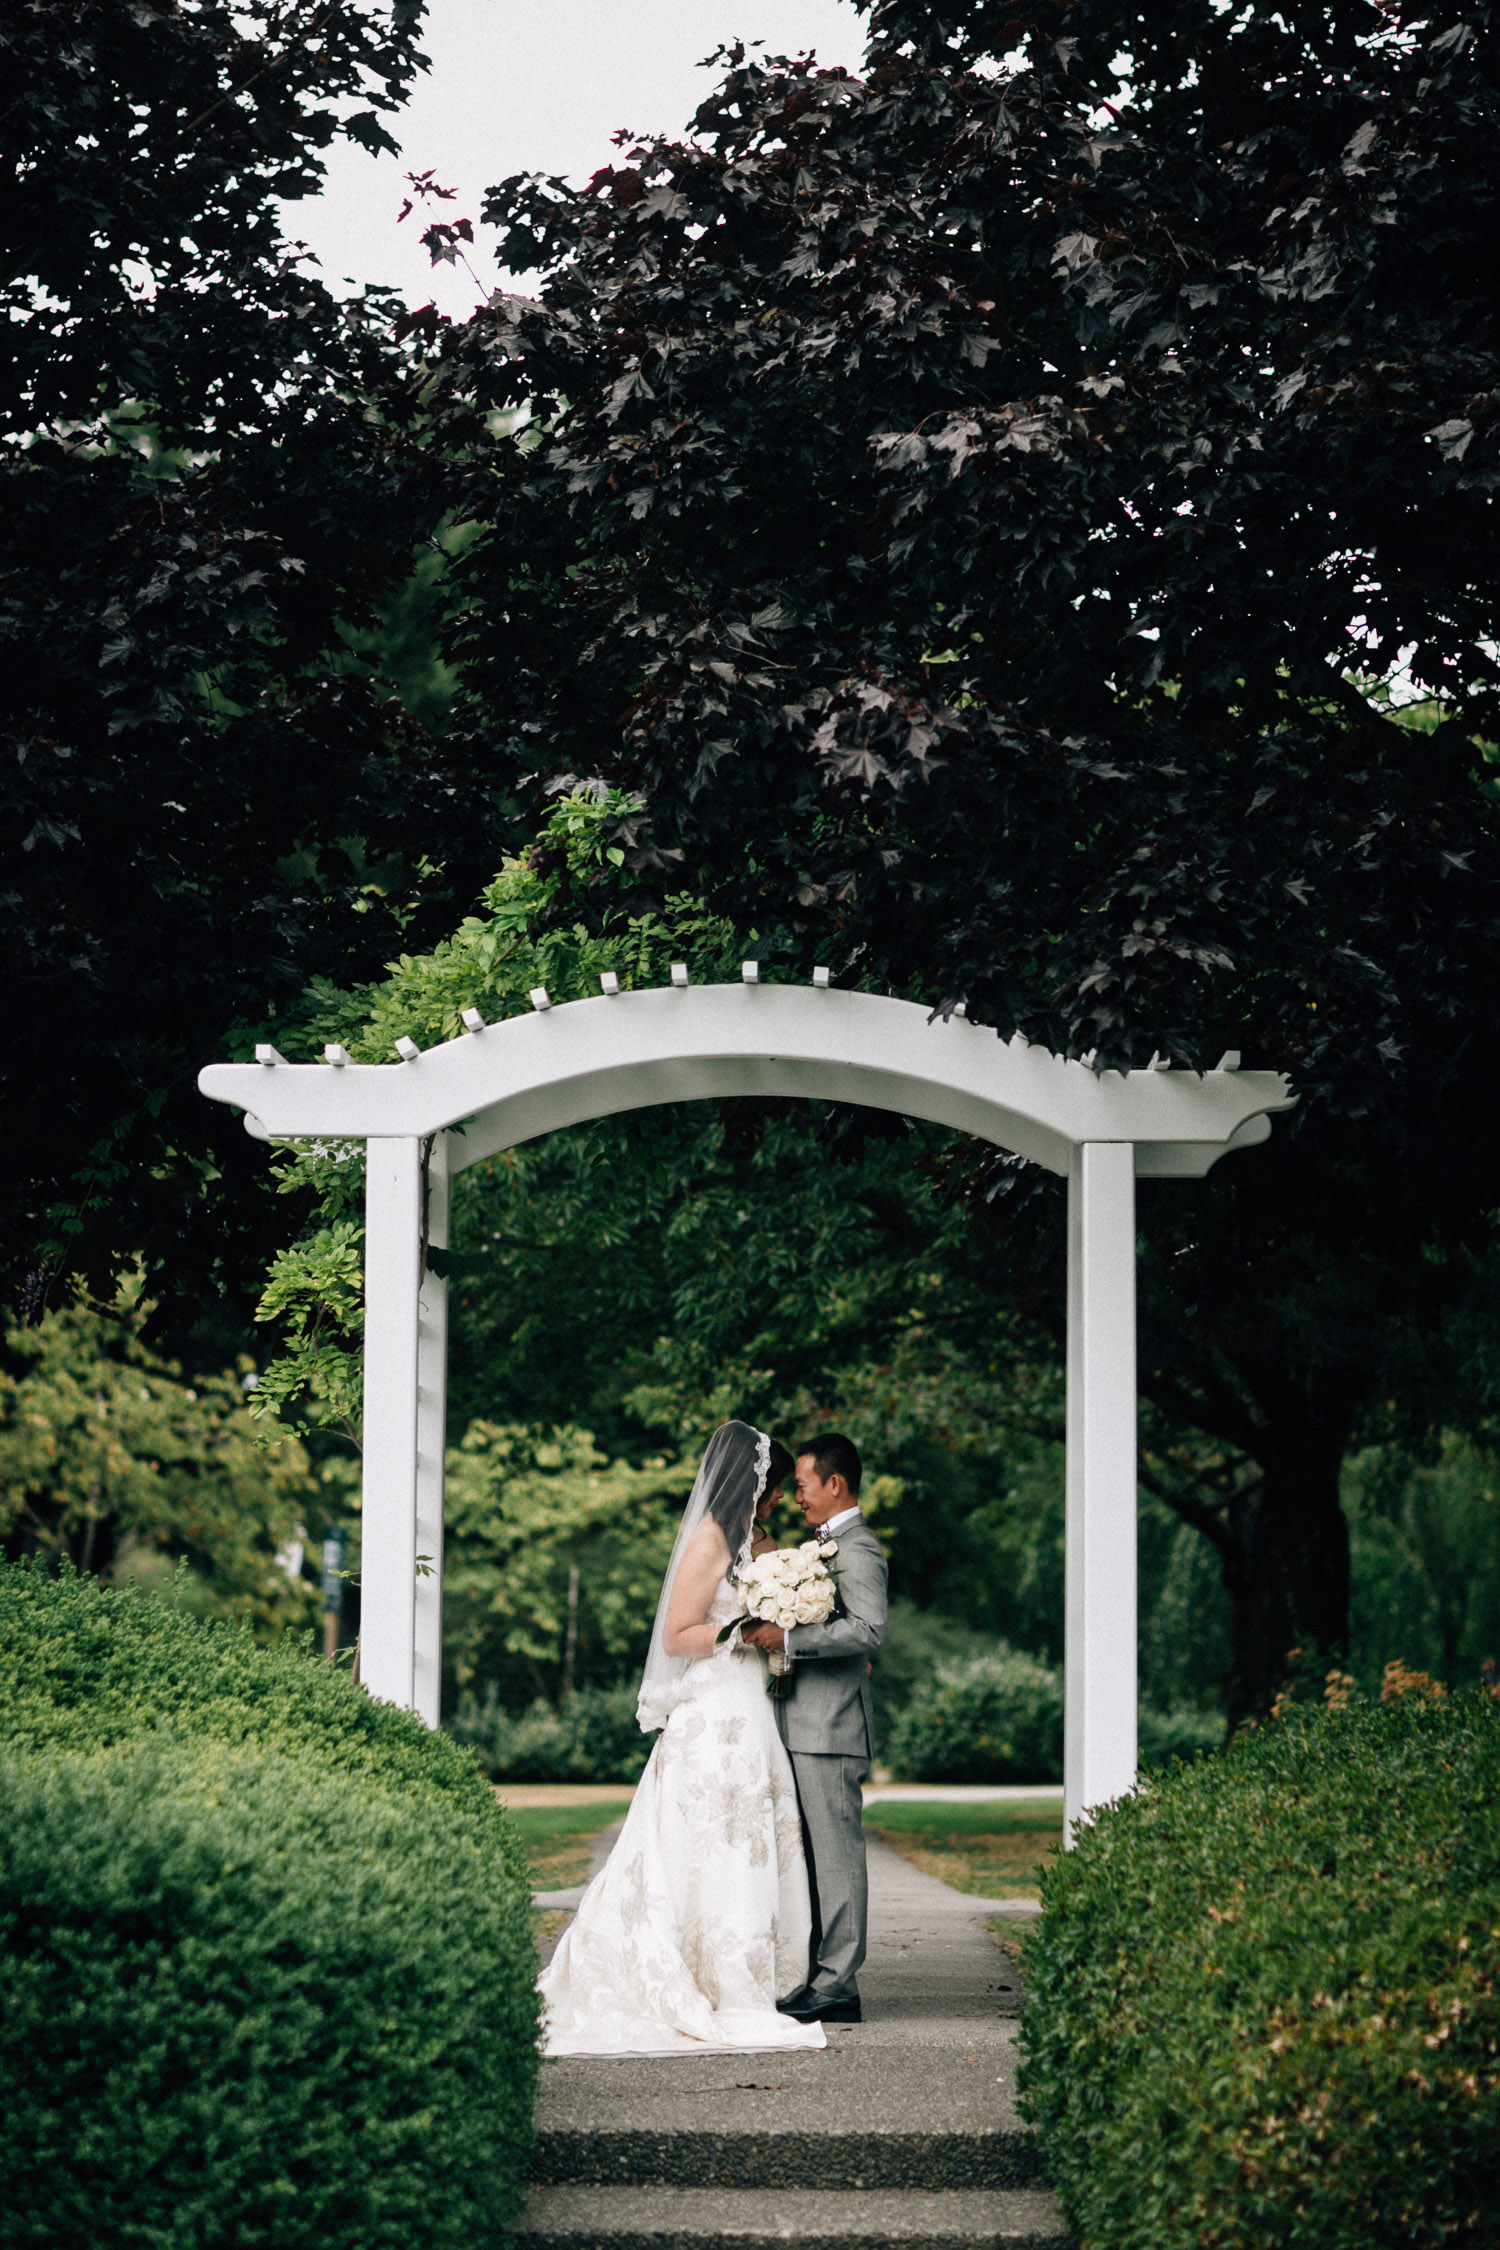 richmond wedding photography at minoru park